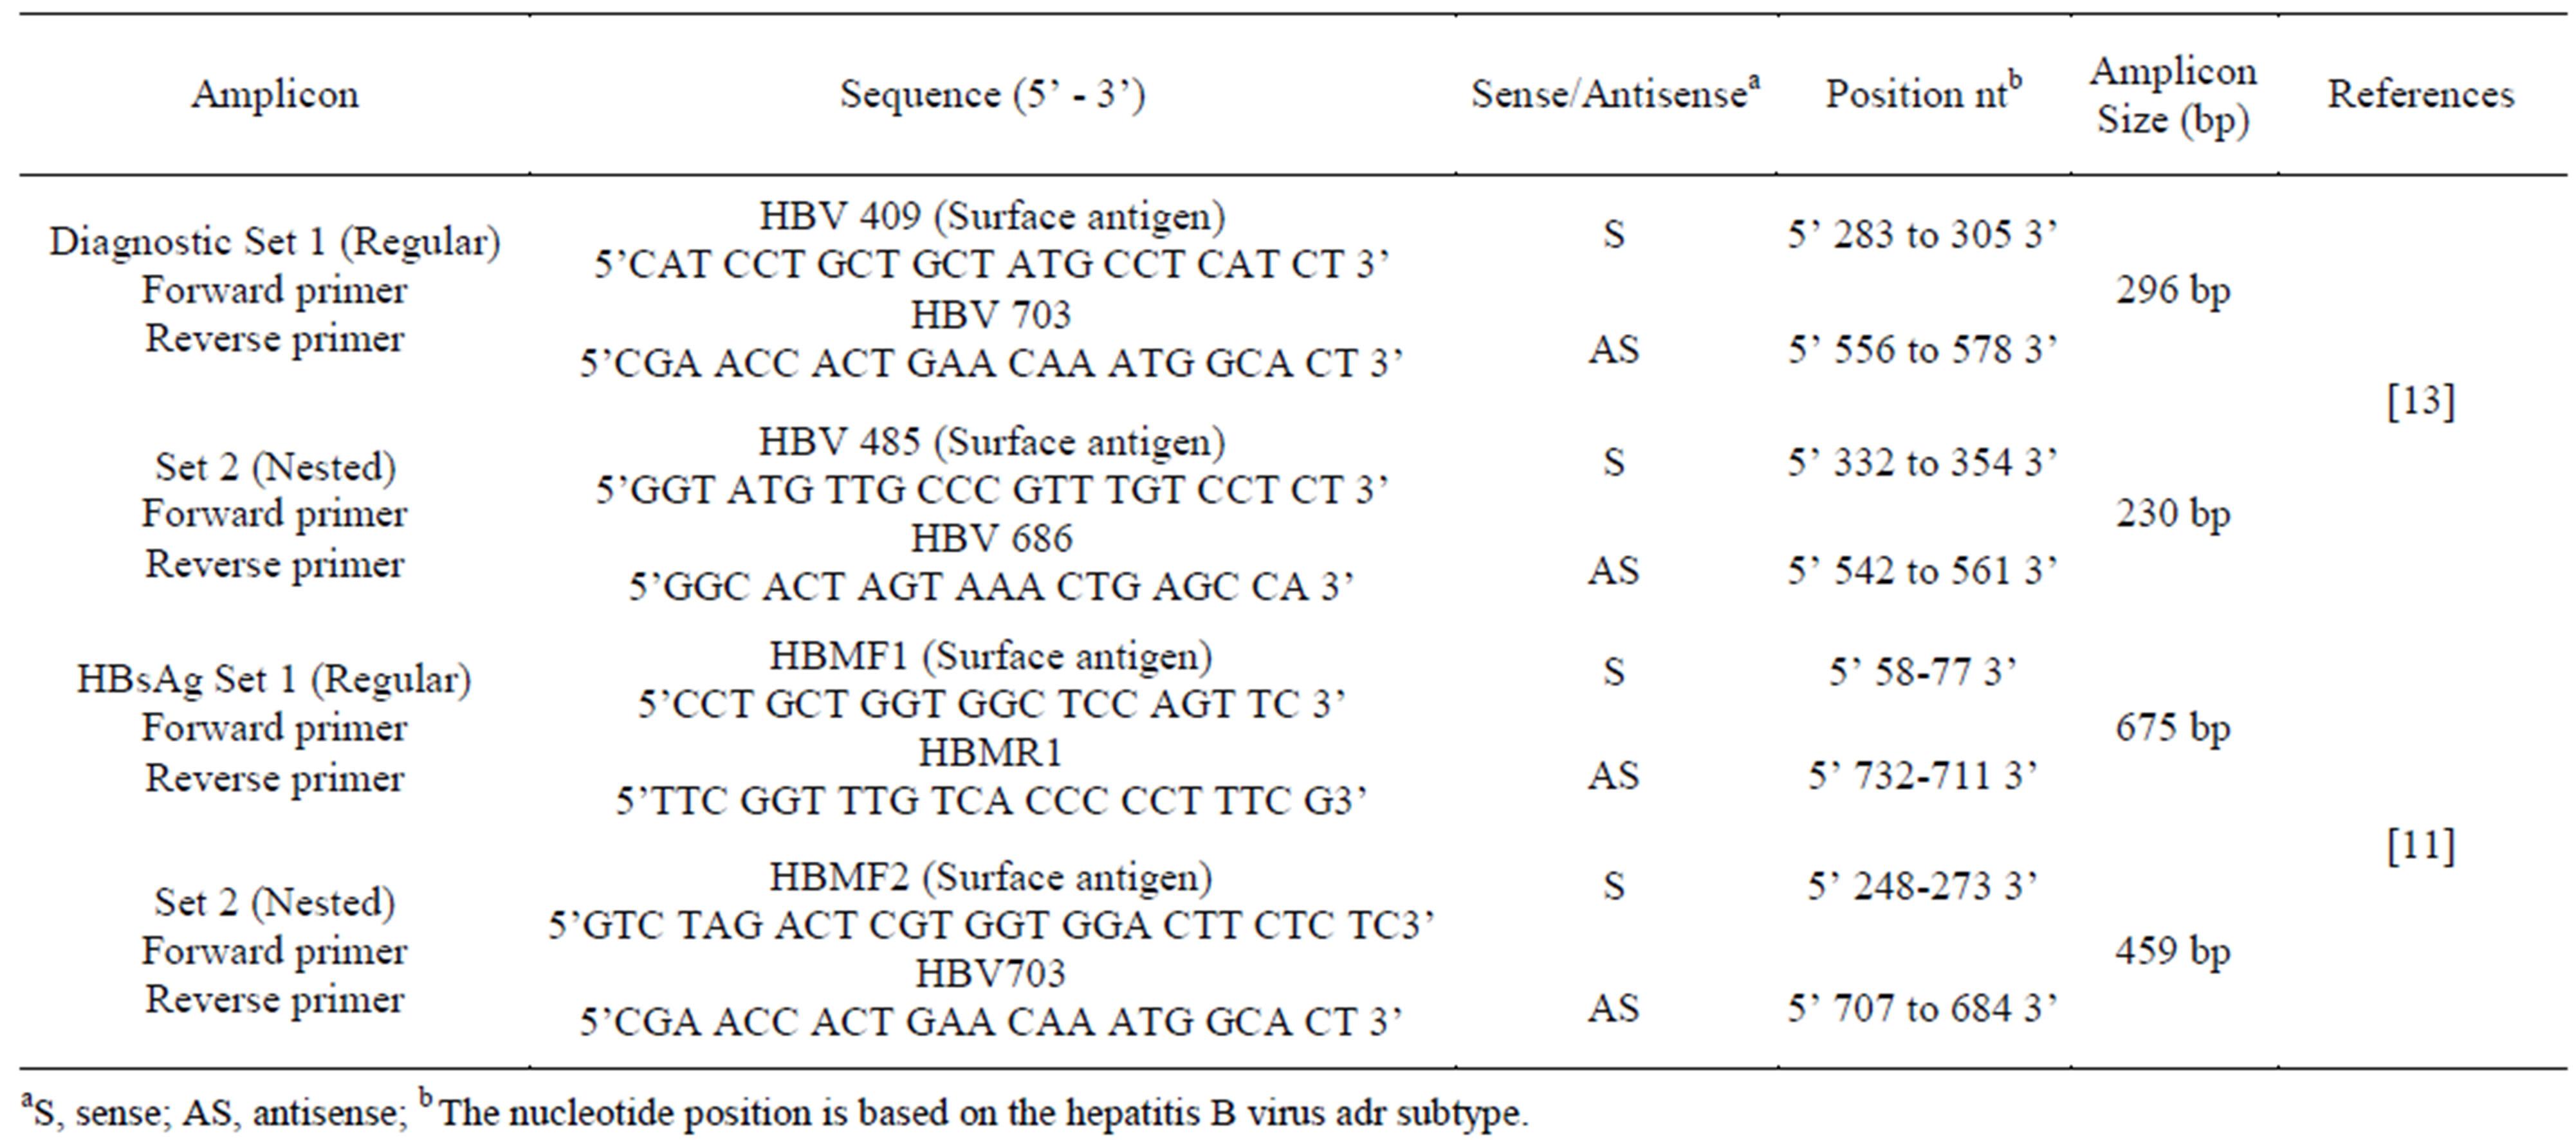 A Molecular Approach for Genotyping of Hepatitis B Virus